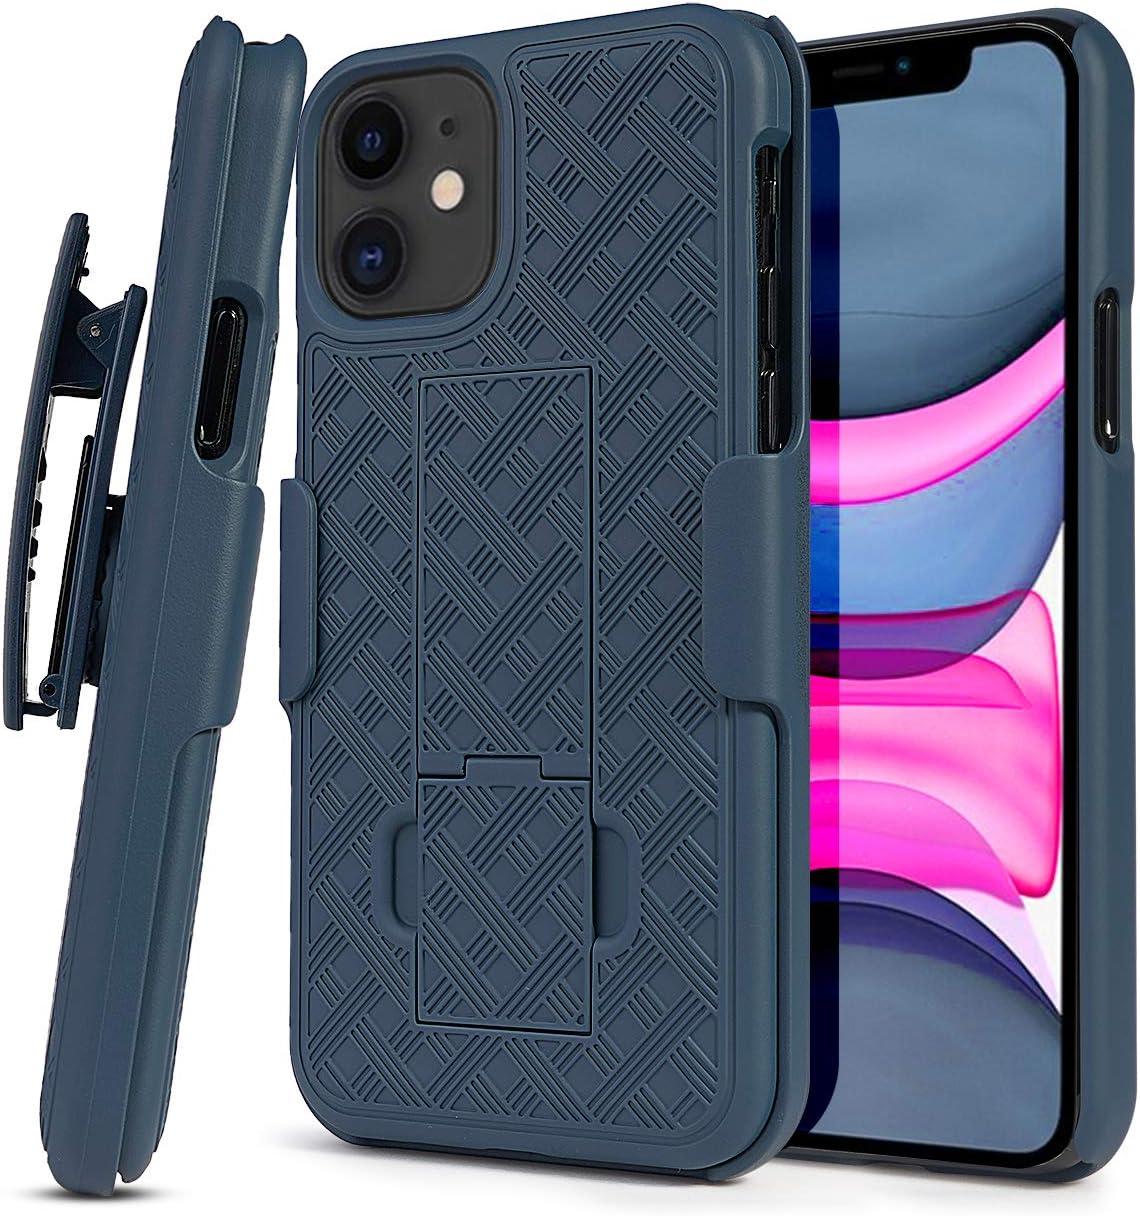 HIDAHE iPhone 11 Belt Clip Holster Case,Phone Holster for iPhone 11,Holster for iPhone 11,Combo Case with Kickstand Rotating Belt Clip Super Slim Shell for Apple iPhone 11 Phone 6.1'' (2019),Blue